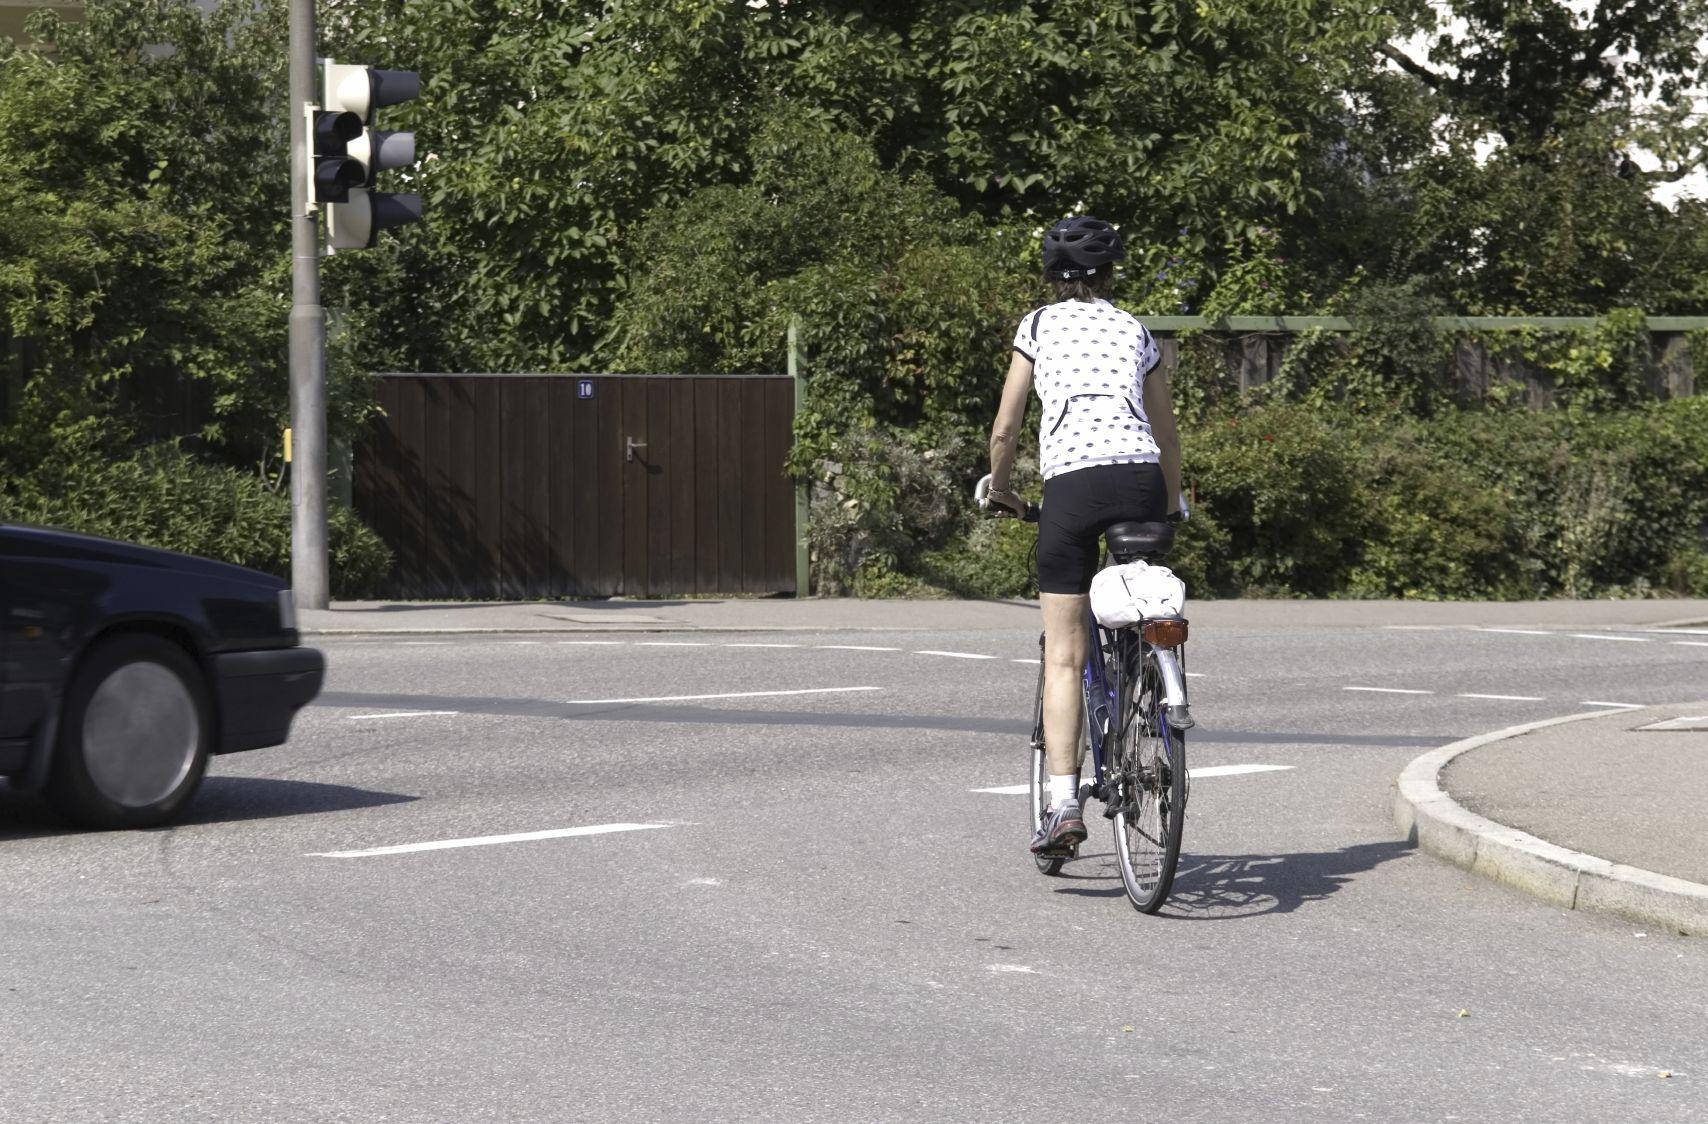 Florida Bike Accident Statistics